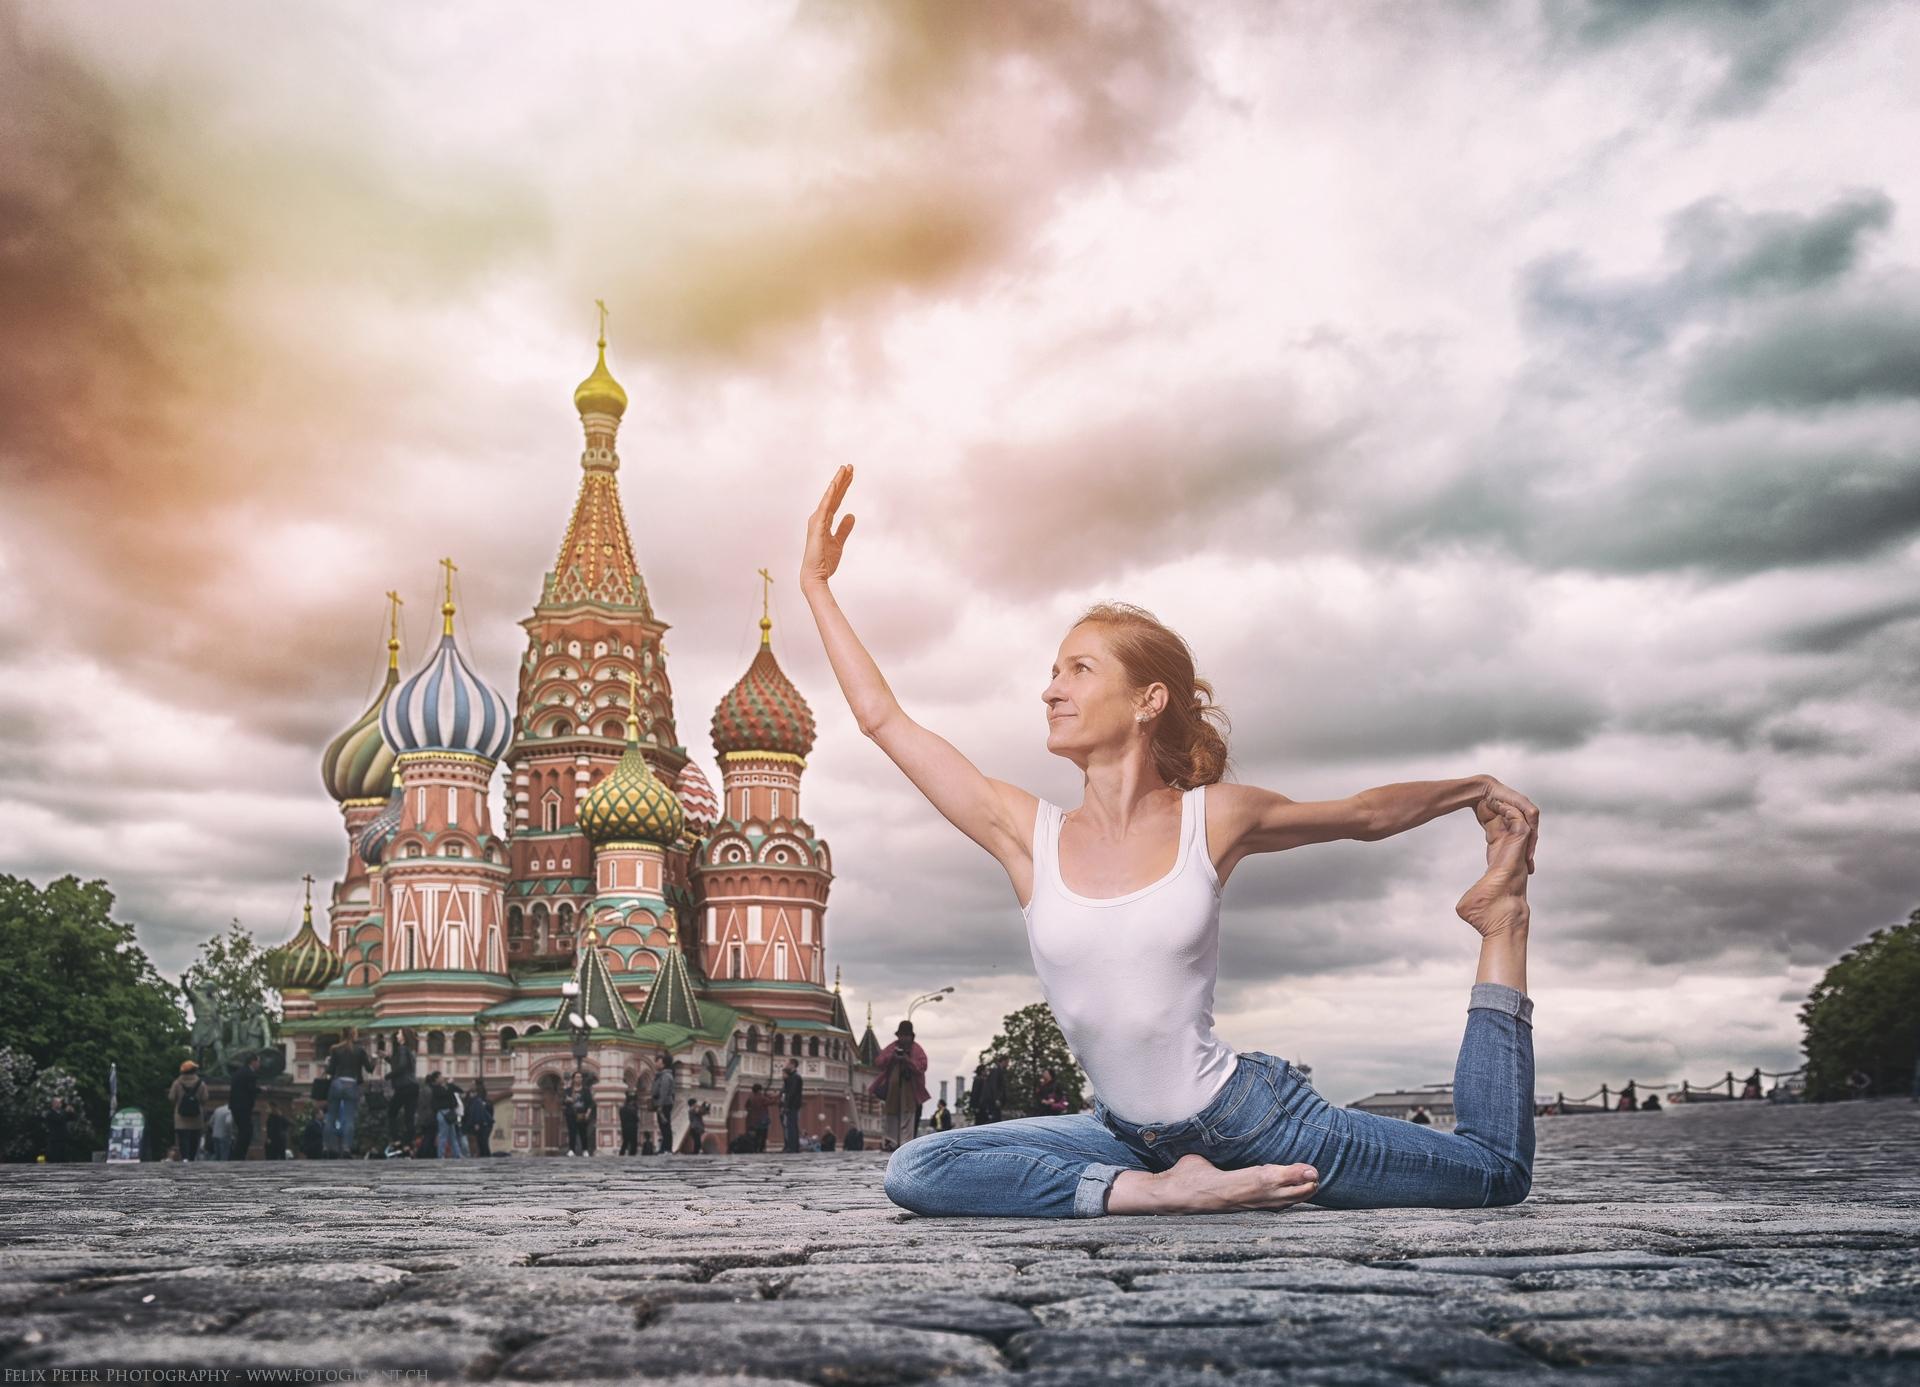 Felix-Peter-Yoga-Pilates-Dance-Fotografie_Bern_115.jpg